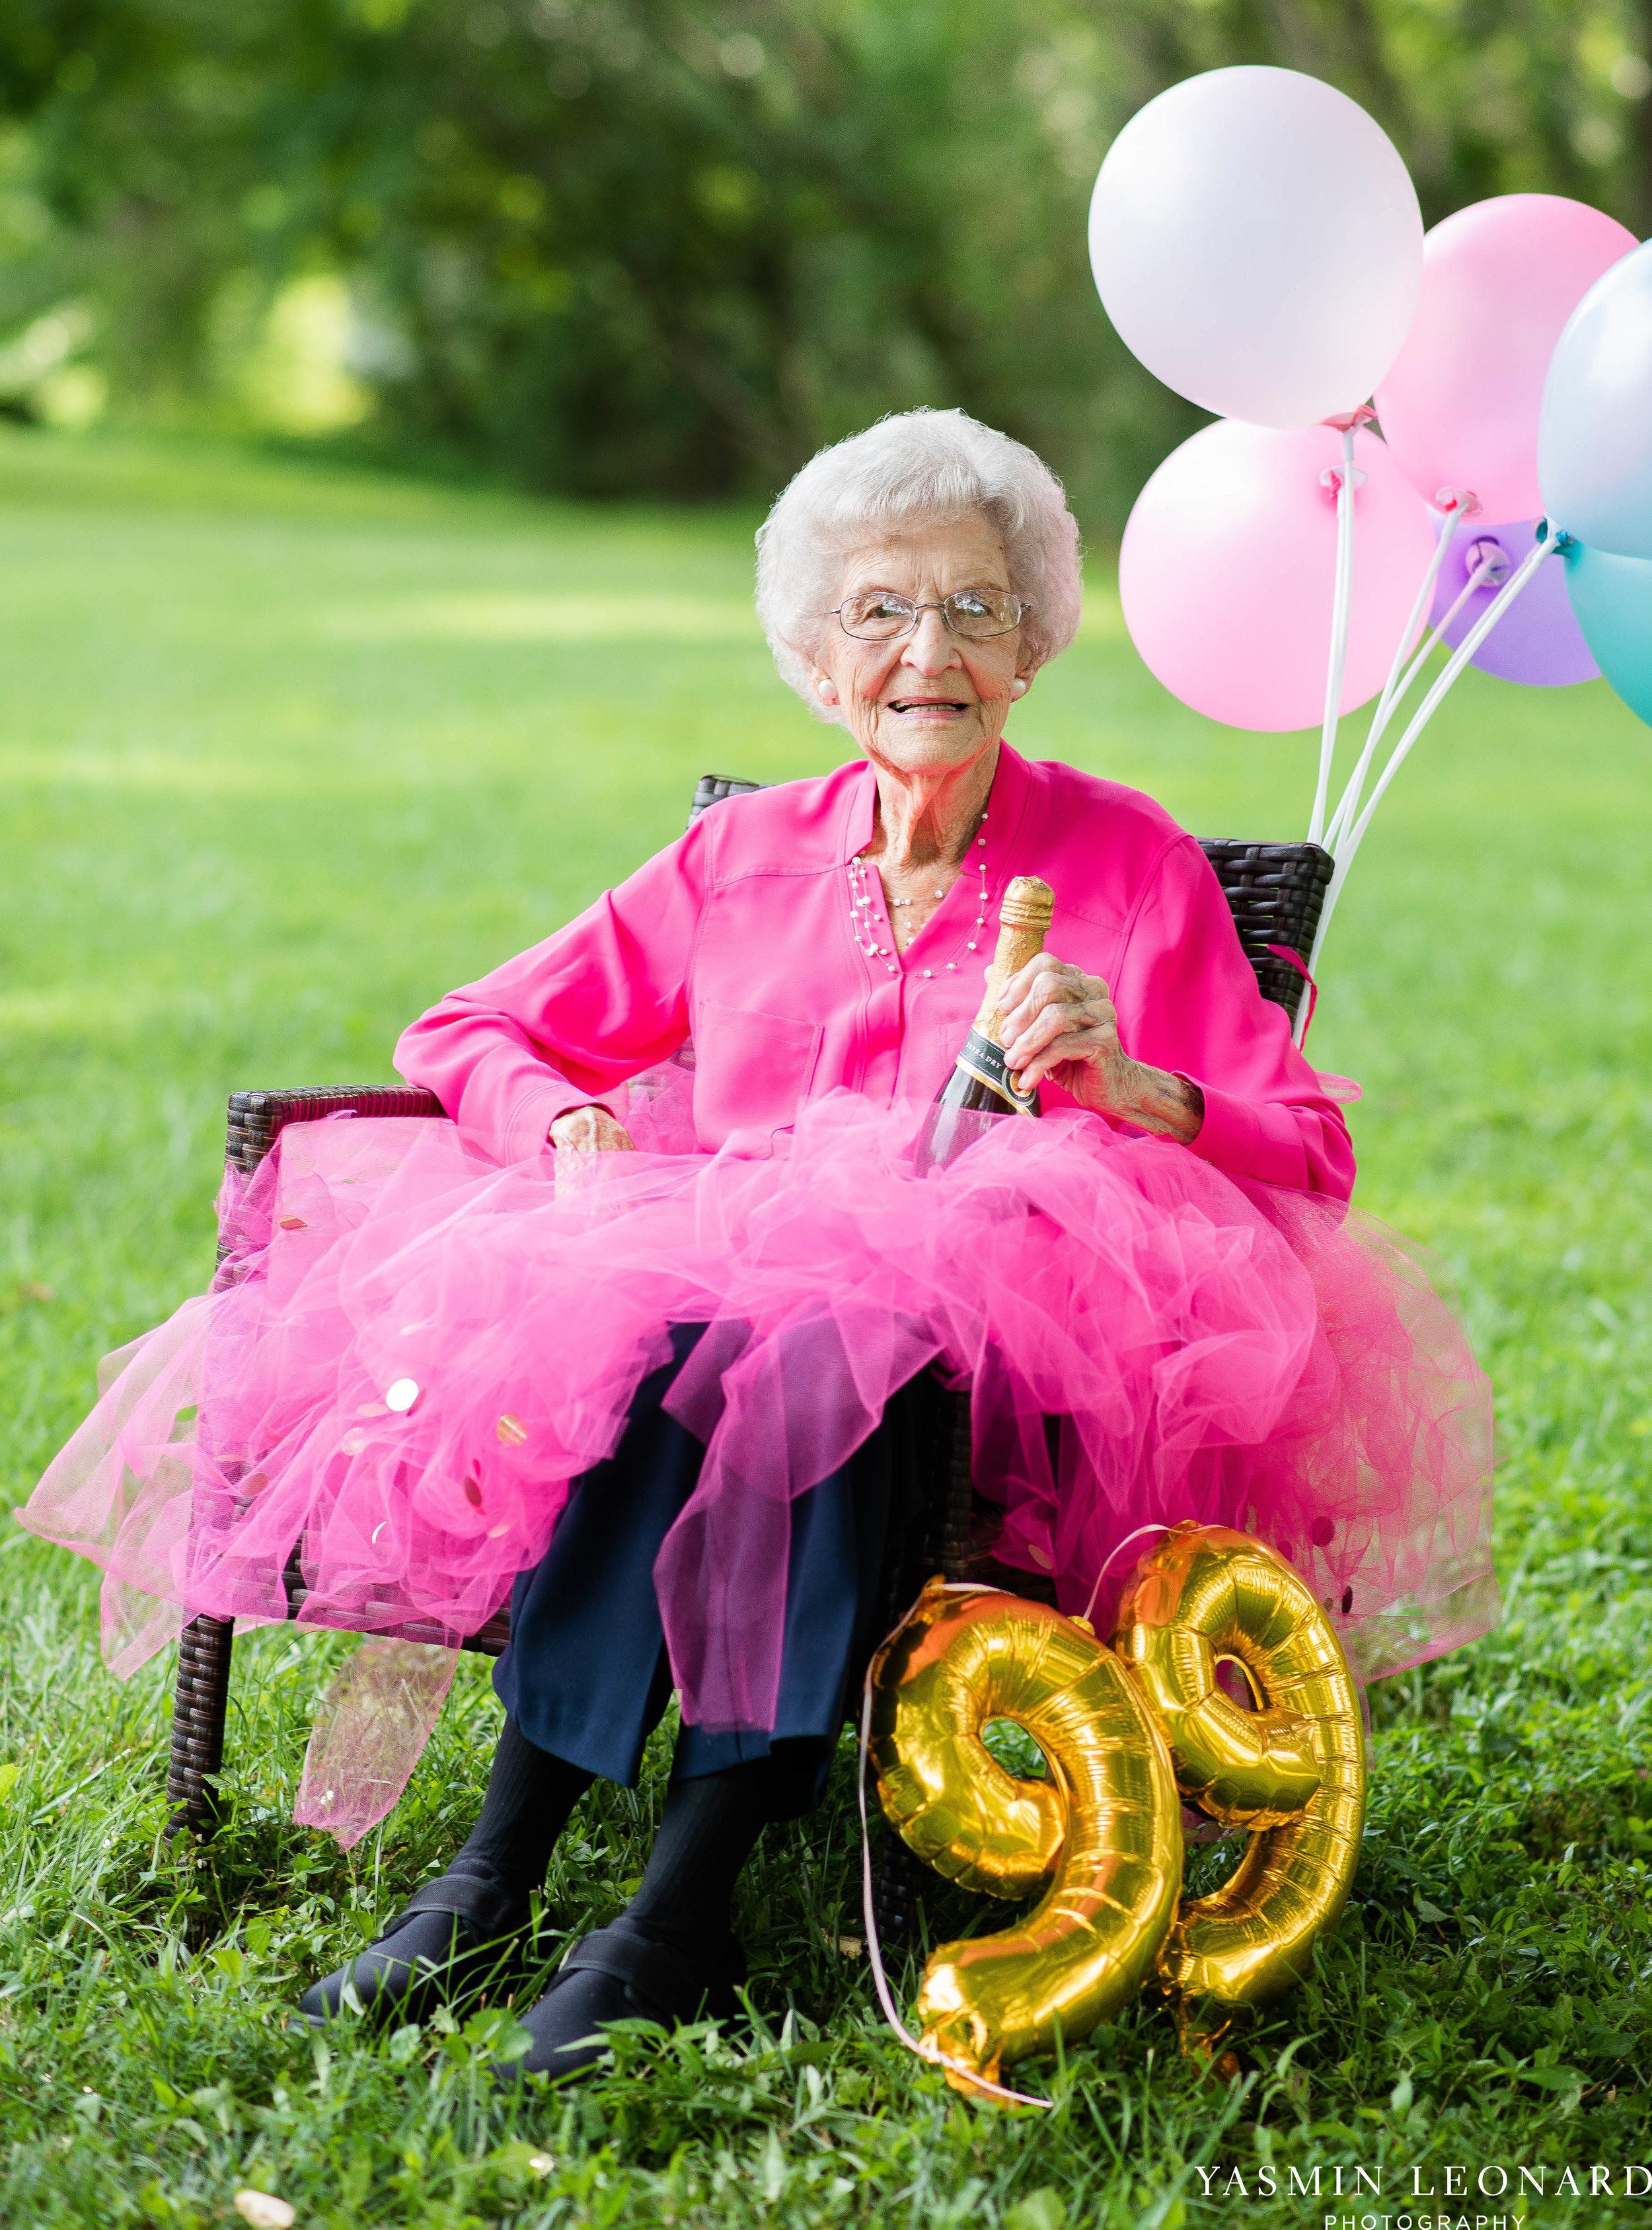 99 Year Old Birthday - Great Grandma Birthday Session - Grandma Birthday Session - 99 years Old - Adult Birthday Session - Four Generations-6.jpg